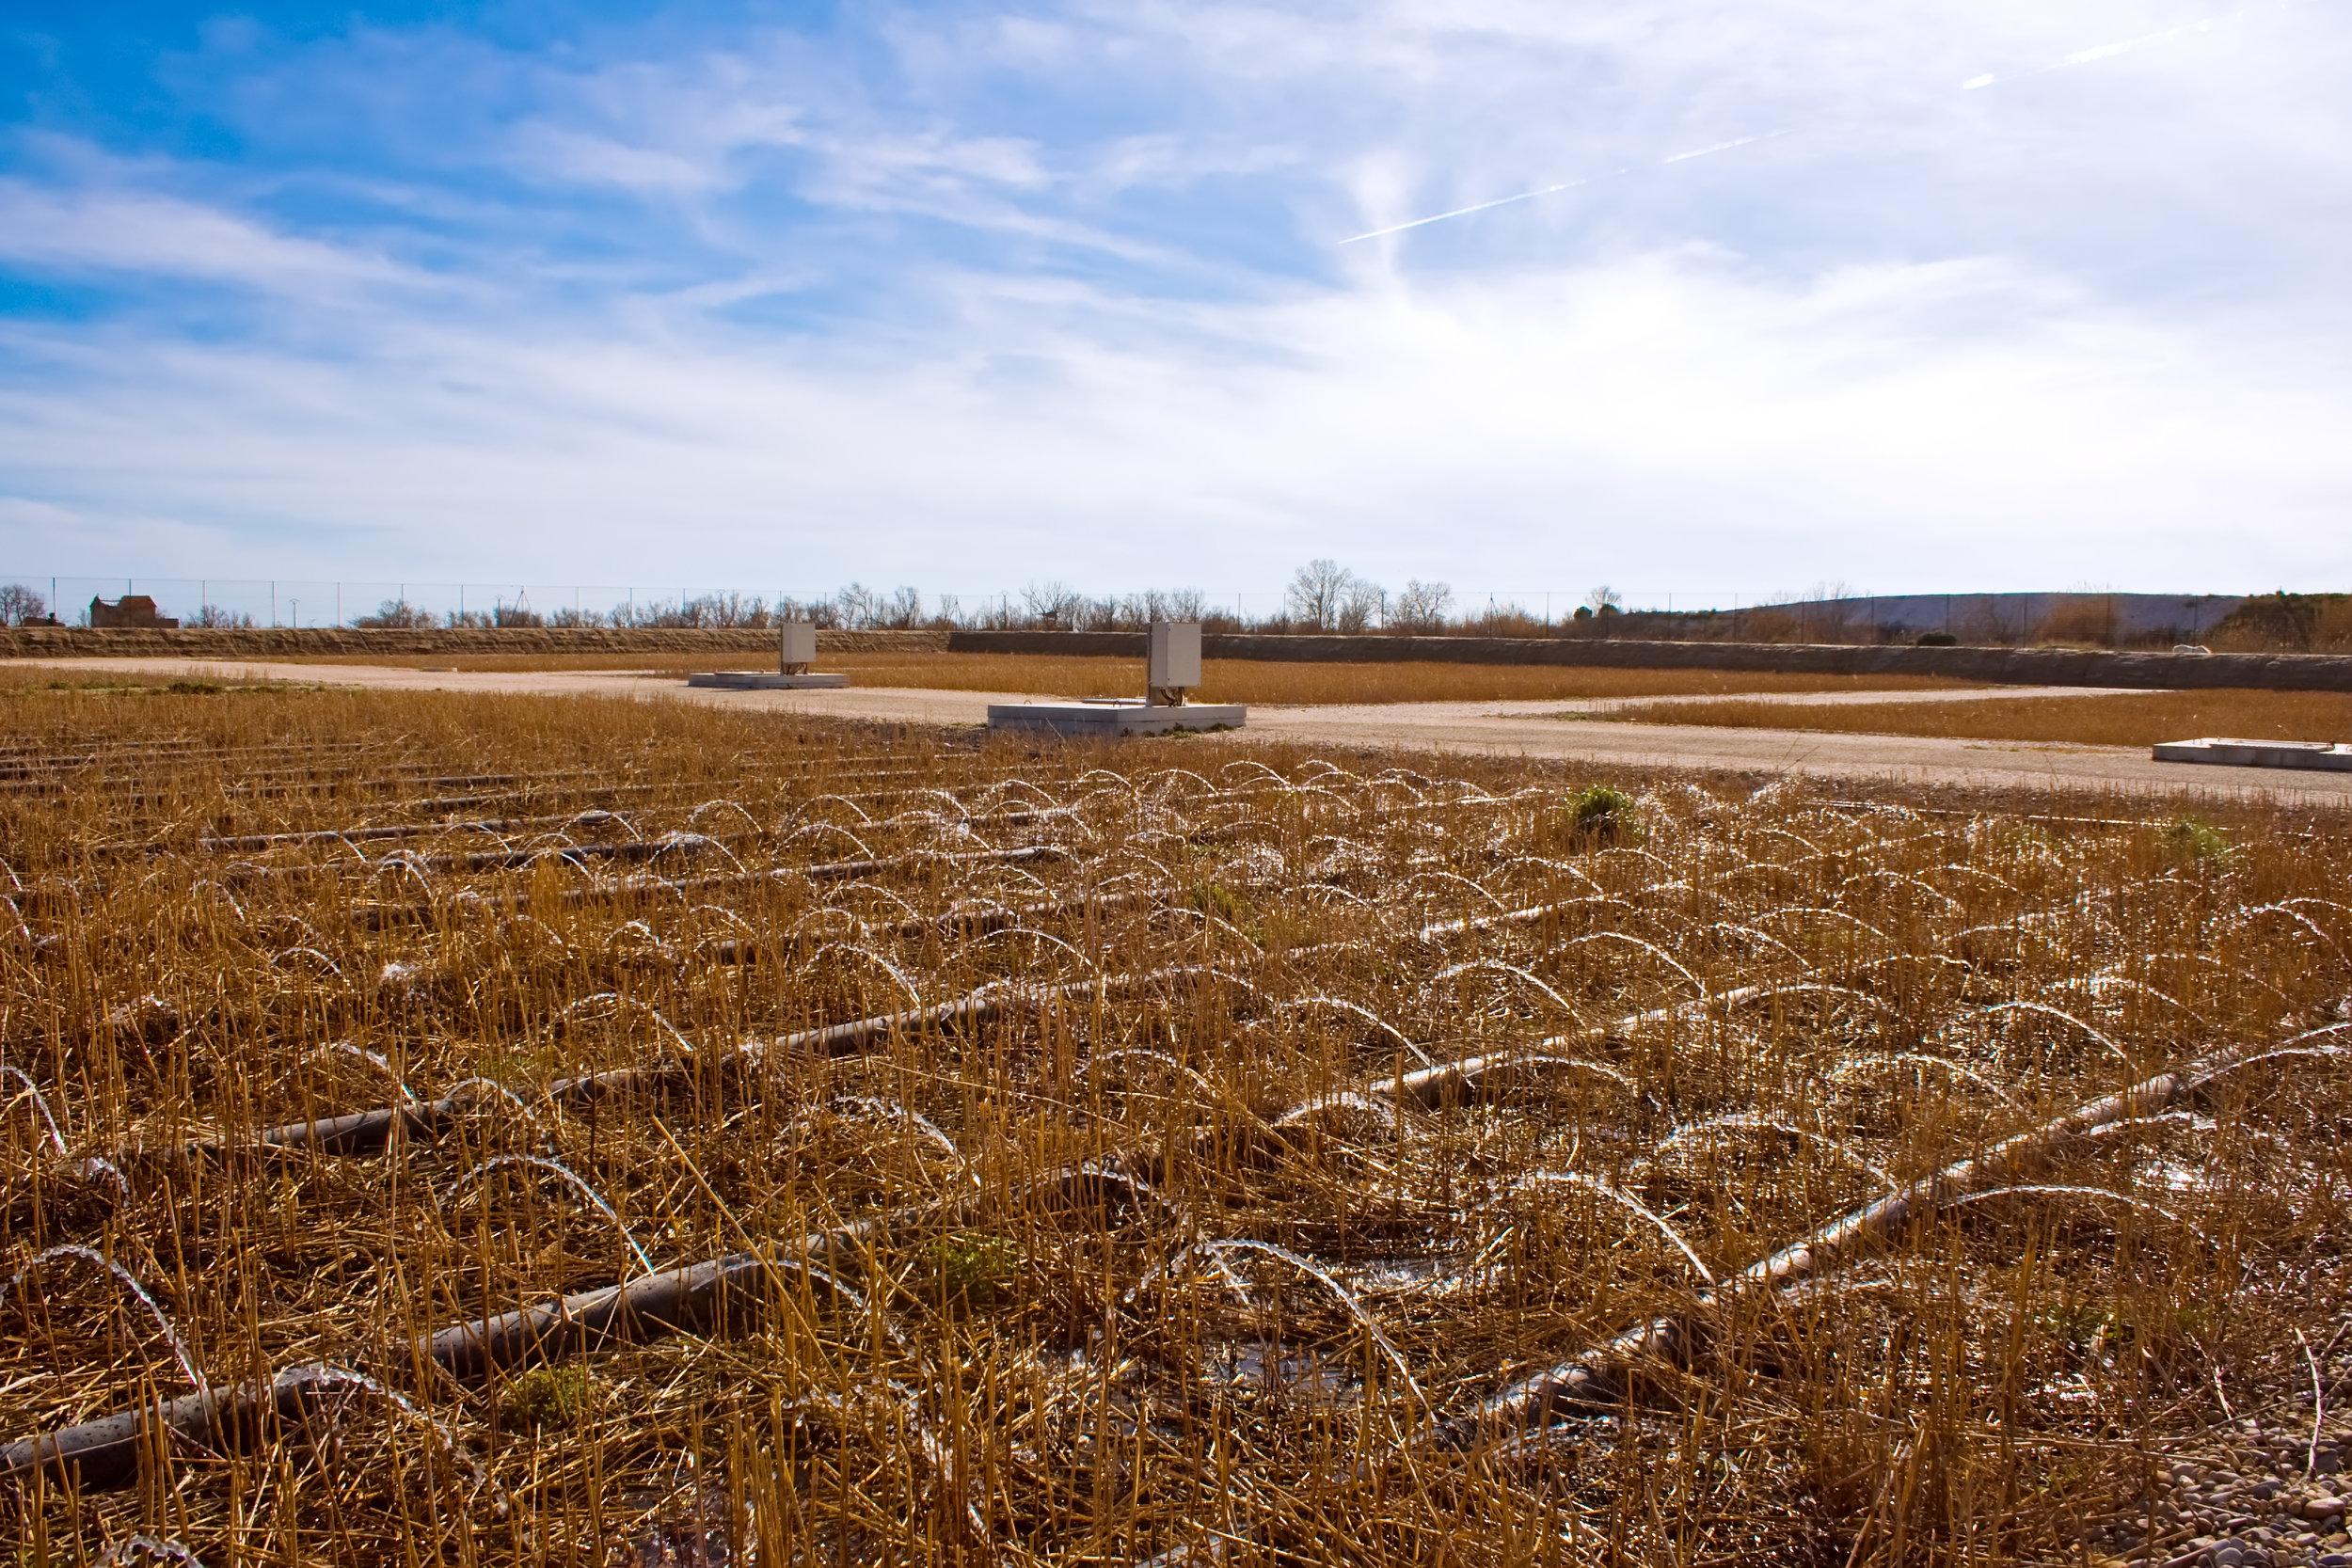 shutterstock_75695698 treatment wetland.jpg